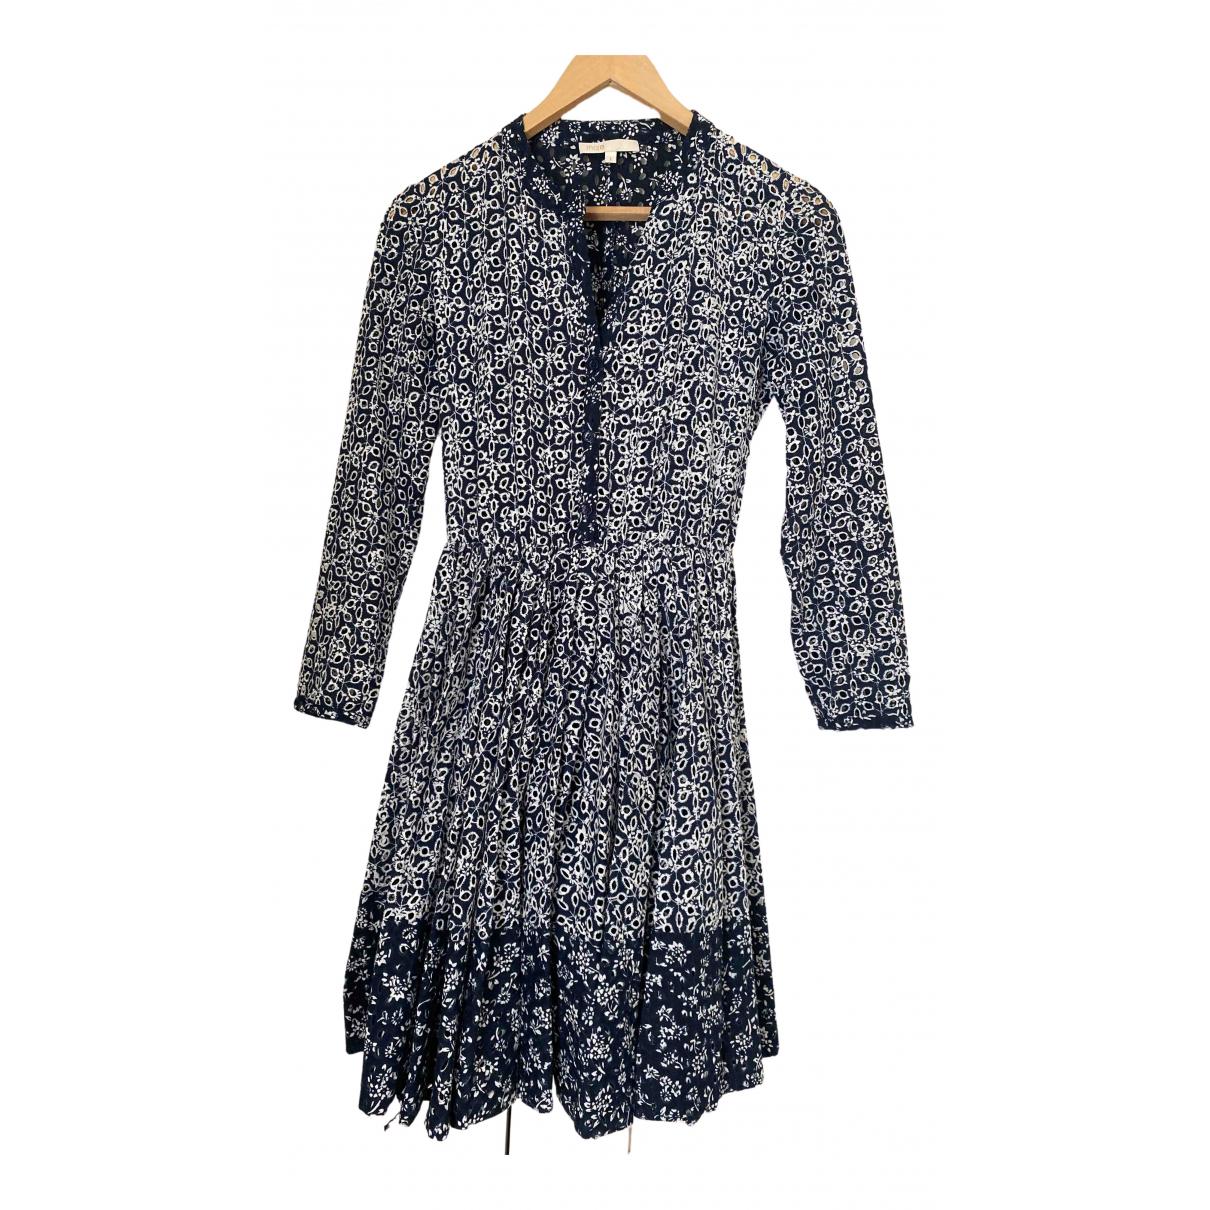 Maje \N Blue Cotton dress for Women 1 US